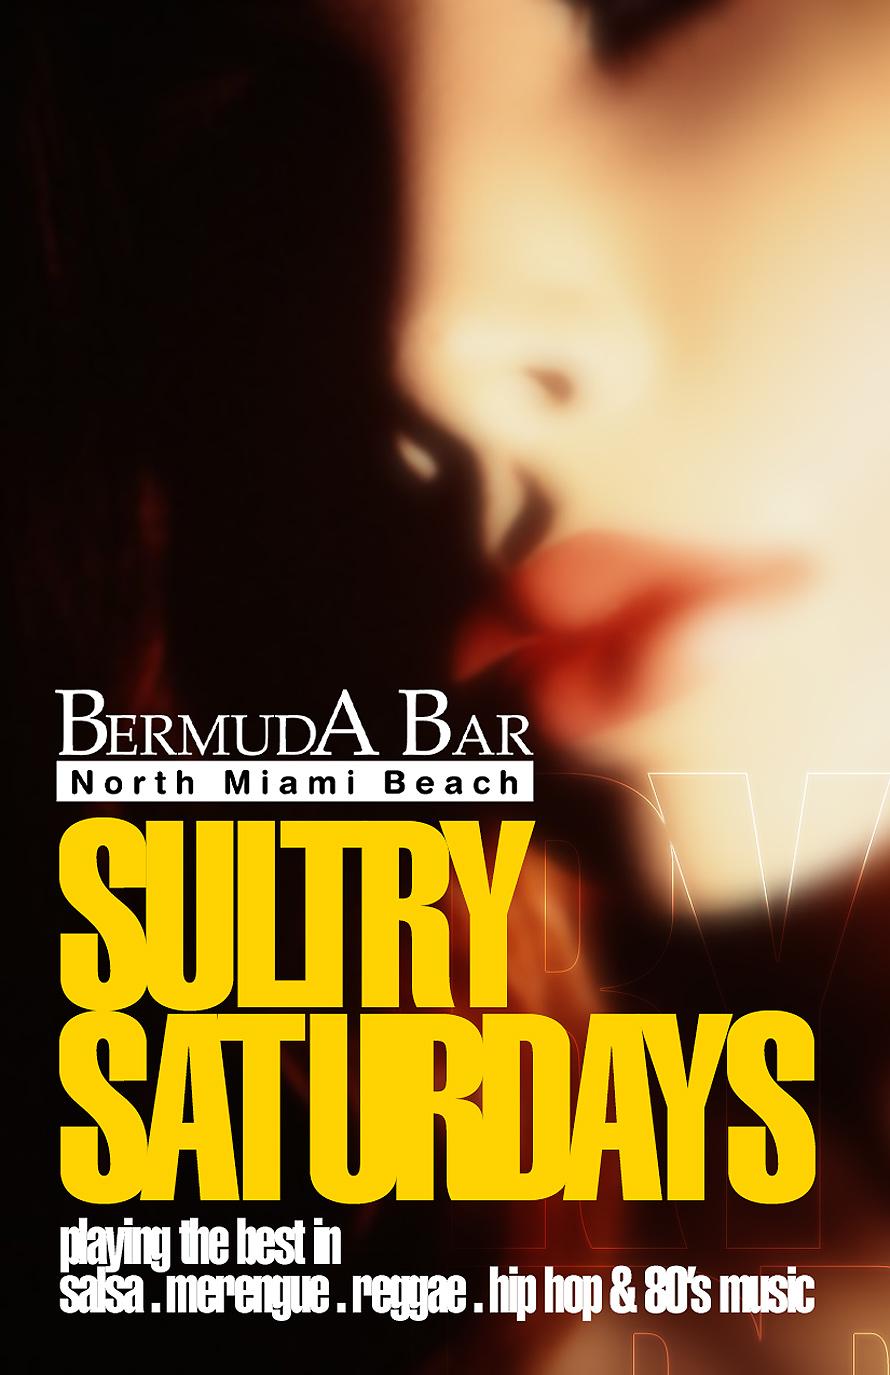 Bermuda Bar Sultry Saturdays